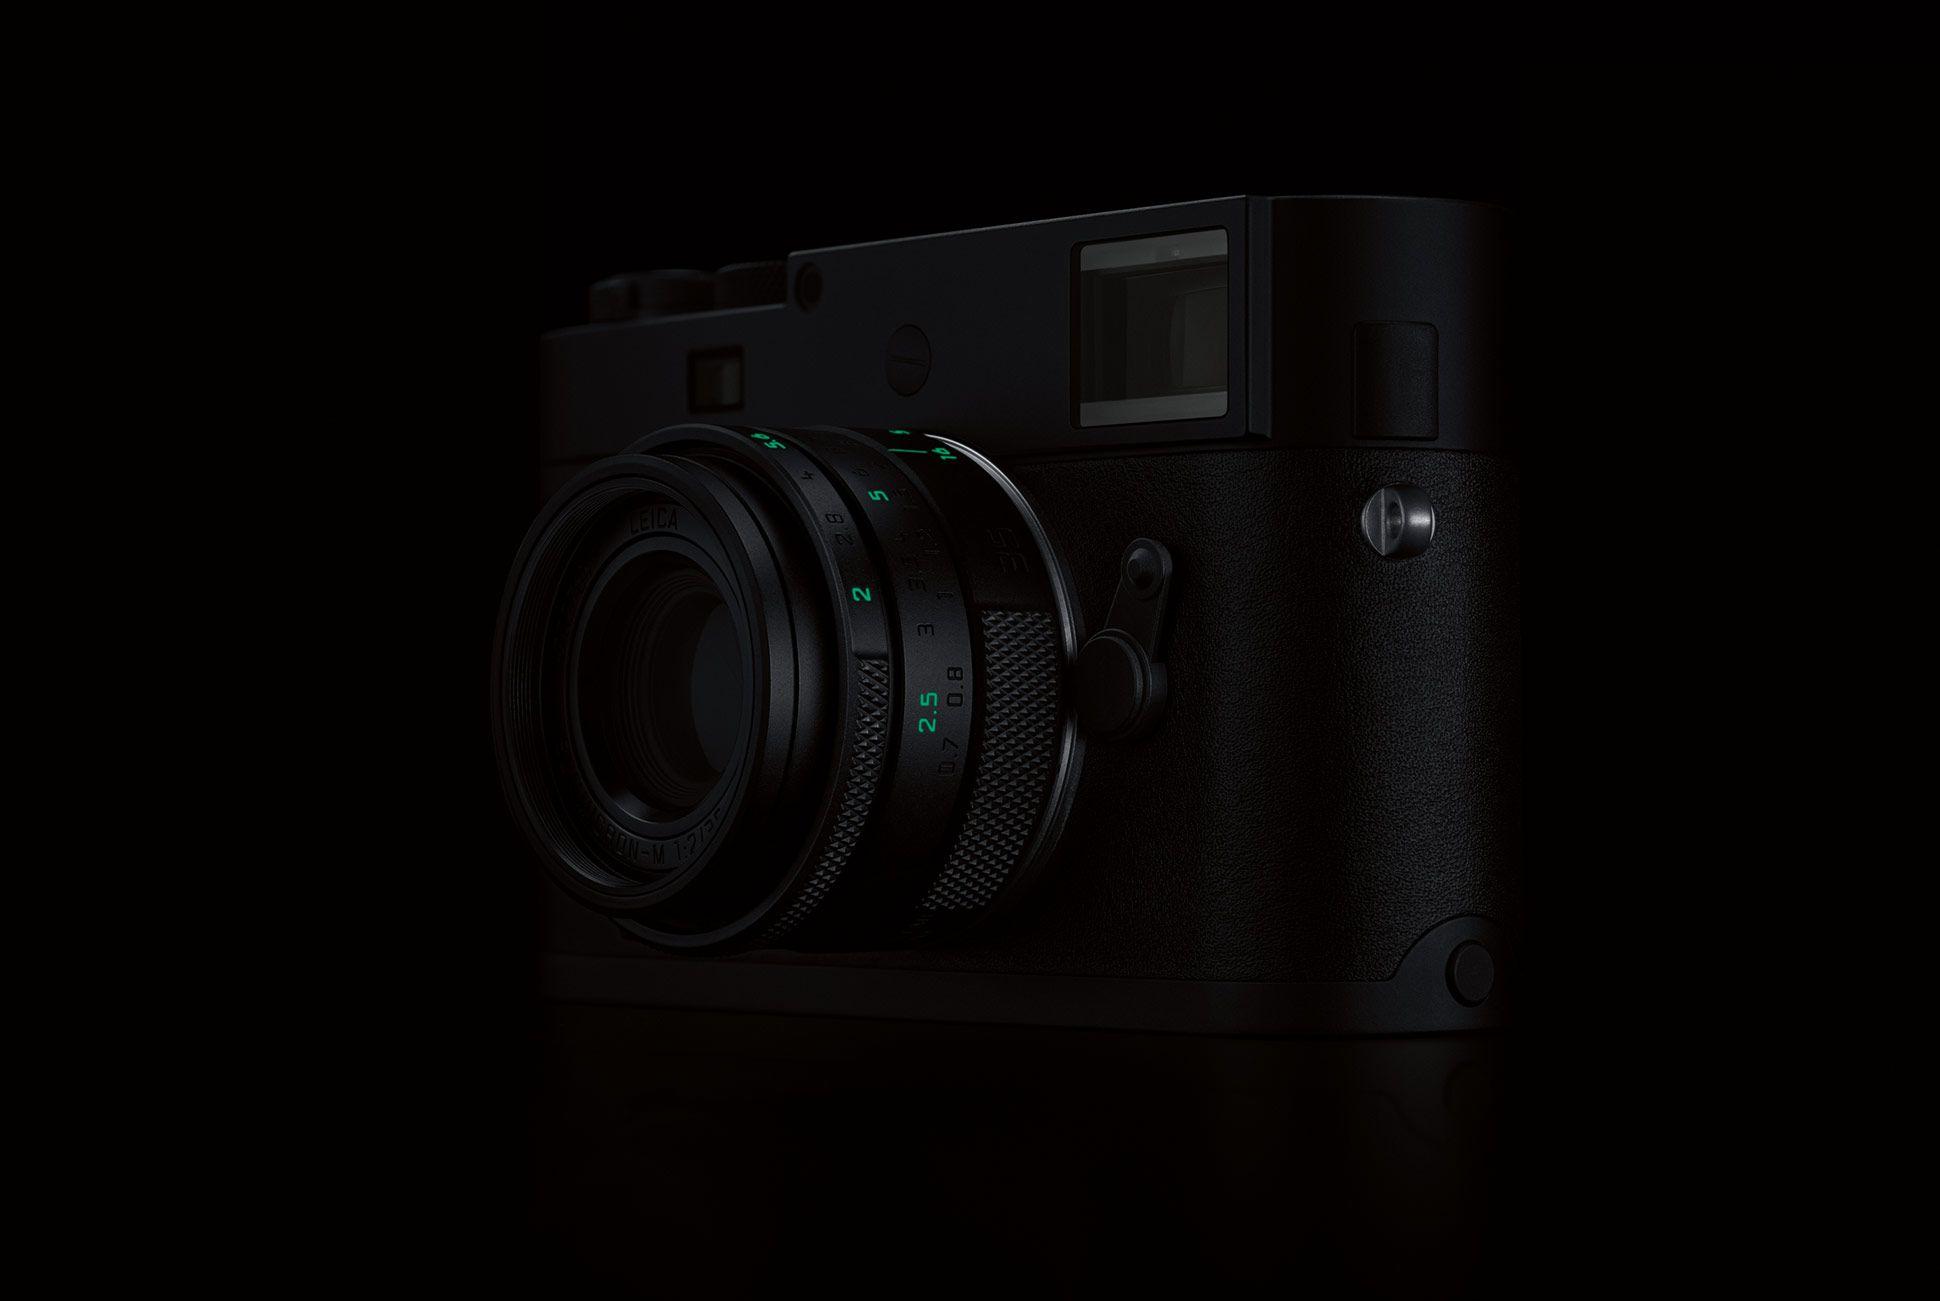 Leica-M-Stealth-Gear-Patrol-Slide-2